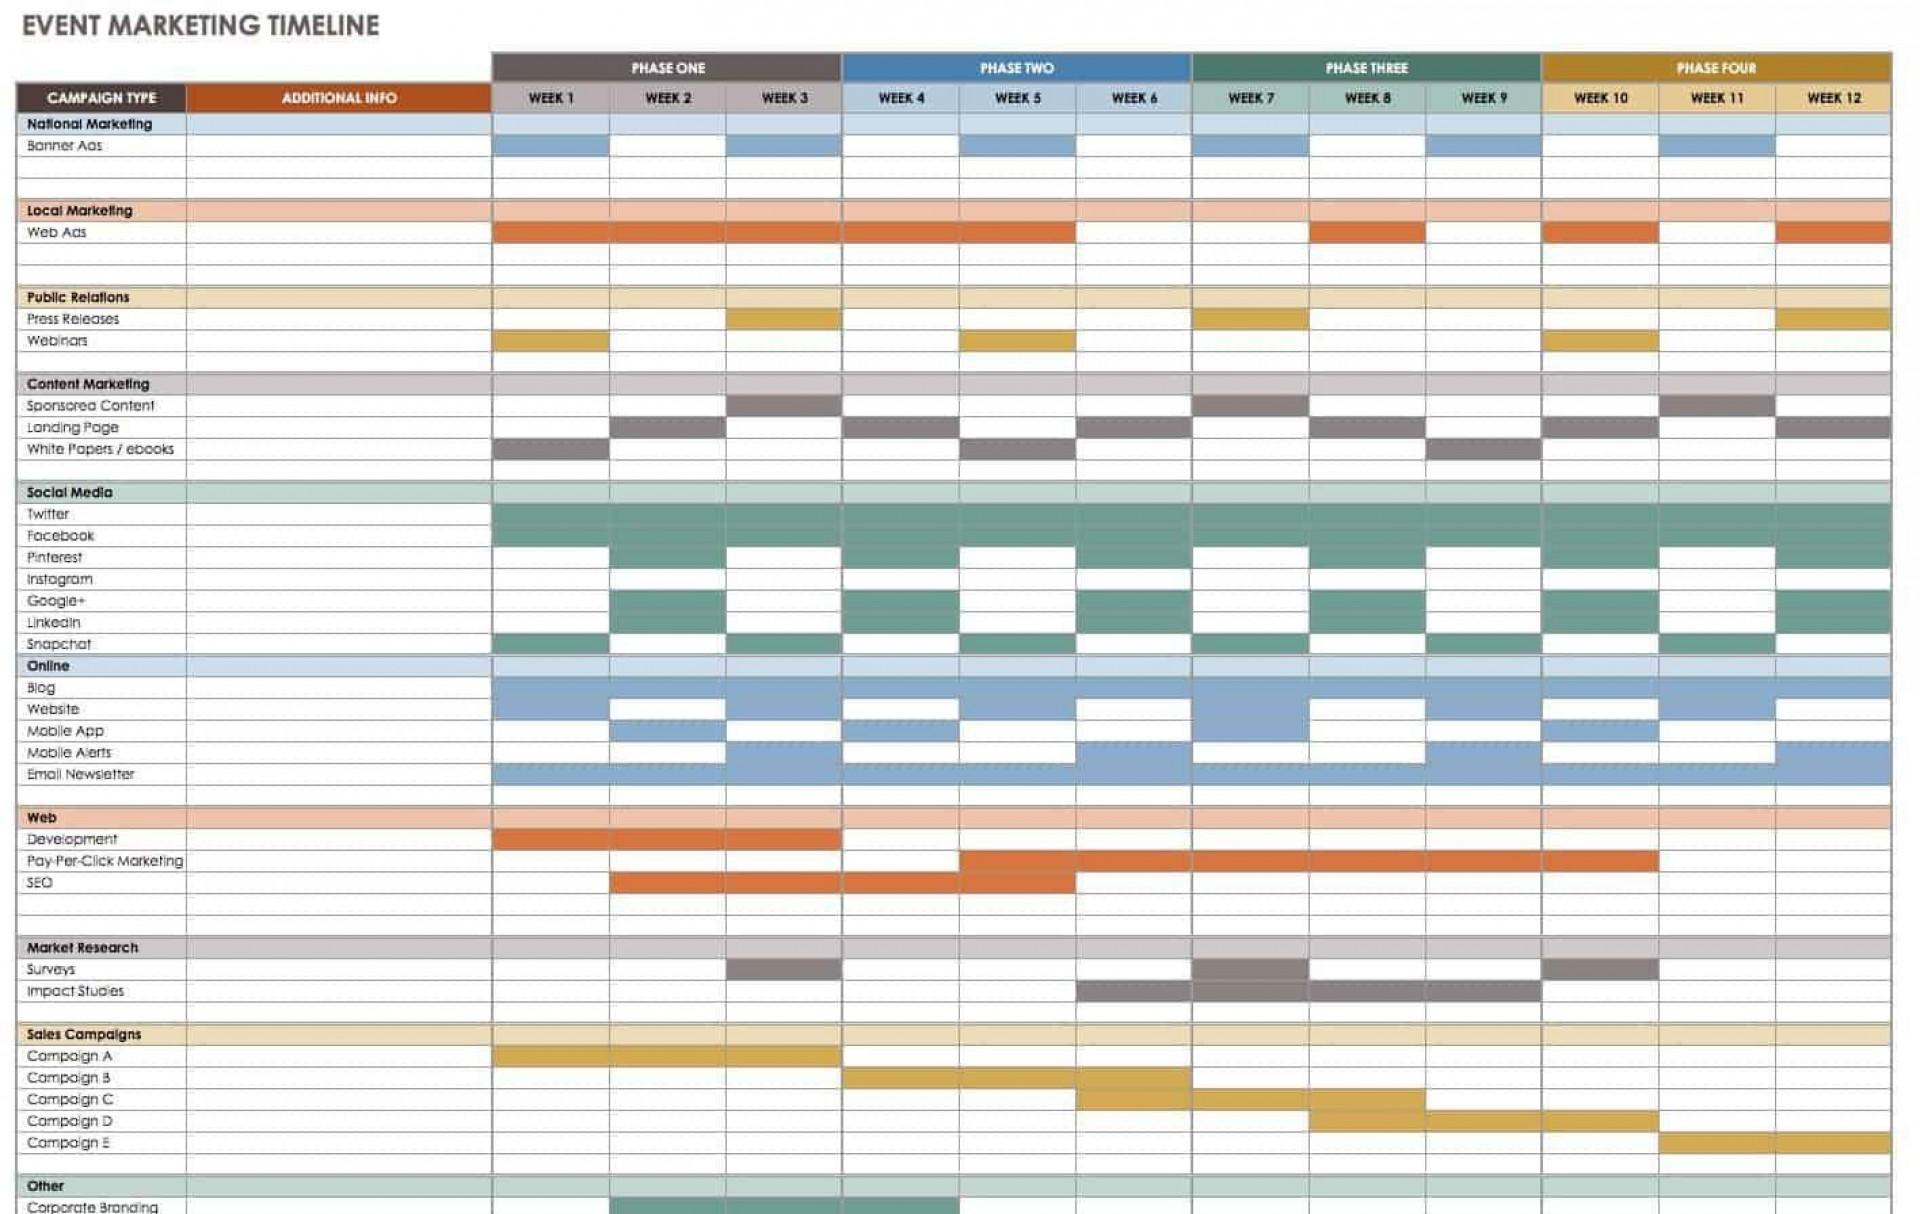 006 Simple Event Planning Worksheet Template Image  Planner Checklist Budget1920